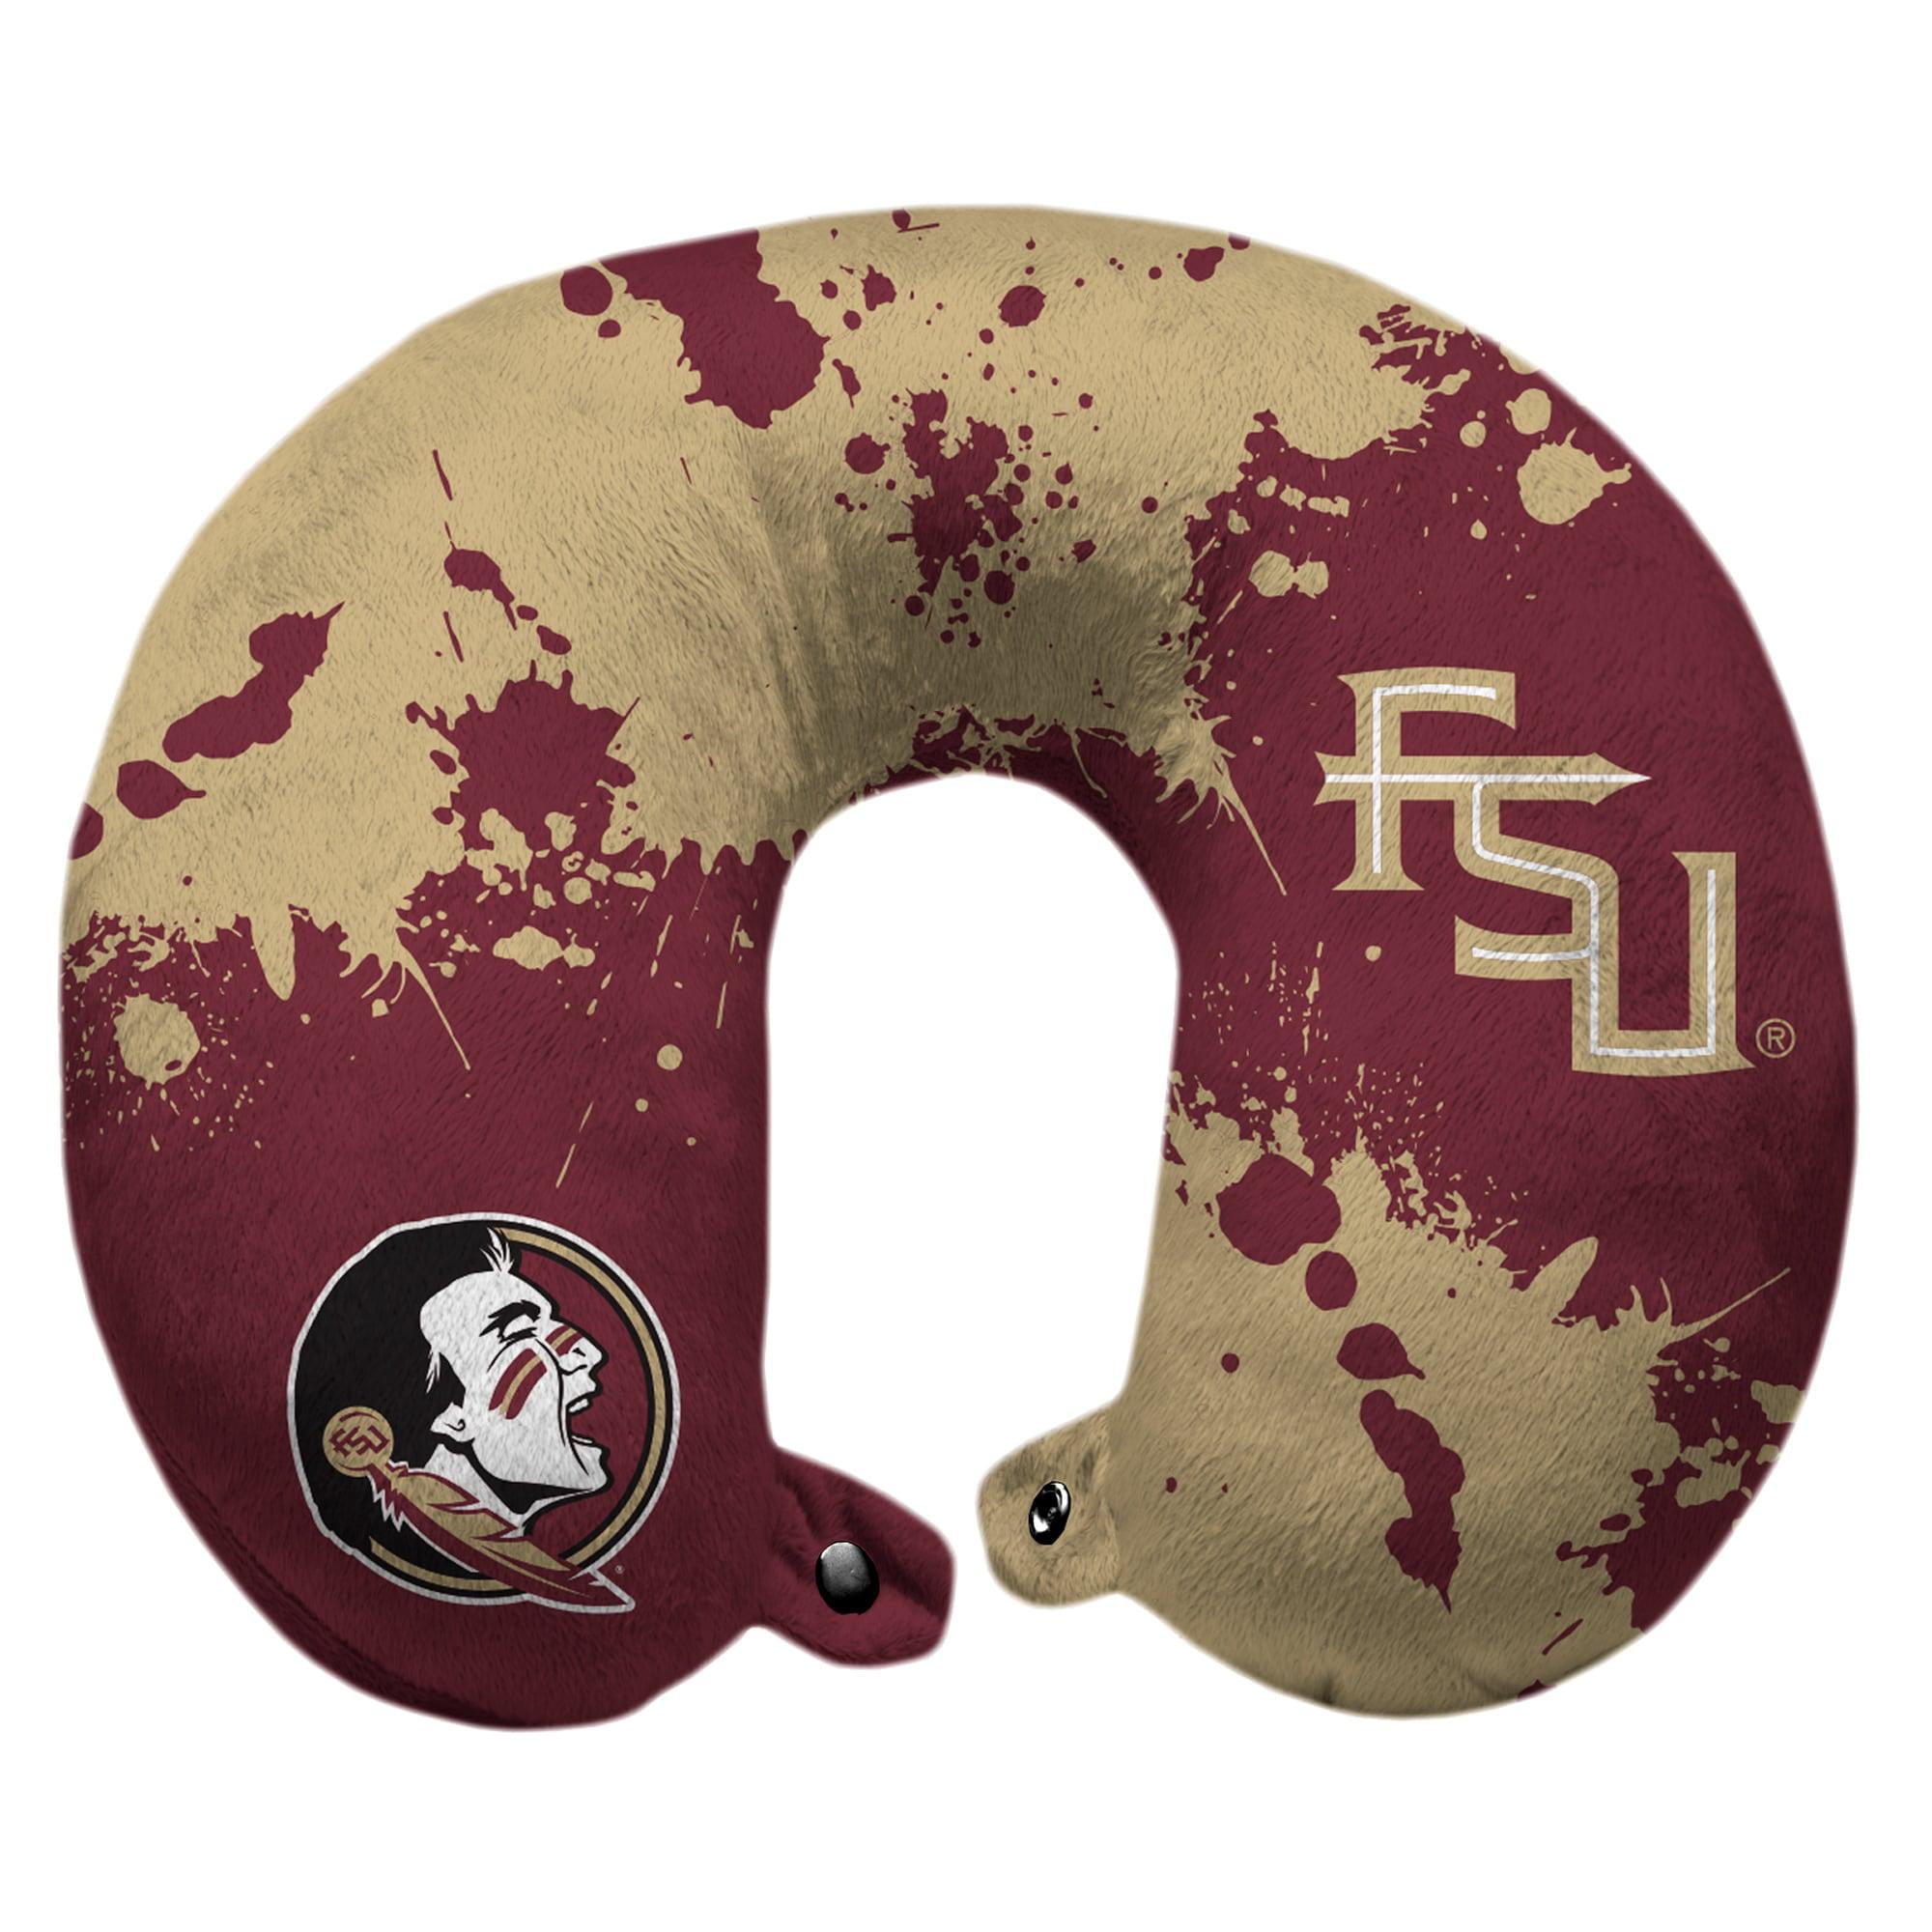 THE NORTHWEST COMPANY NCAA Florida State Seminoles 11 Cloud Travel Pillow